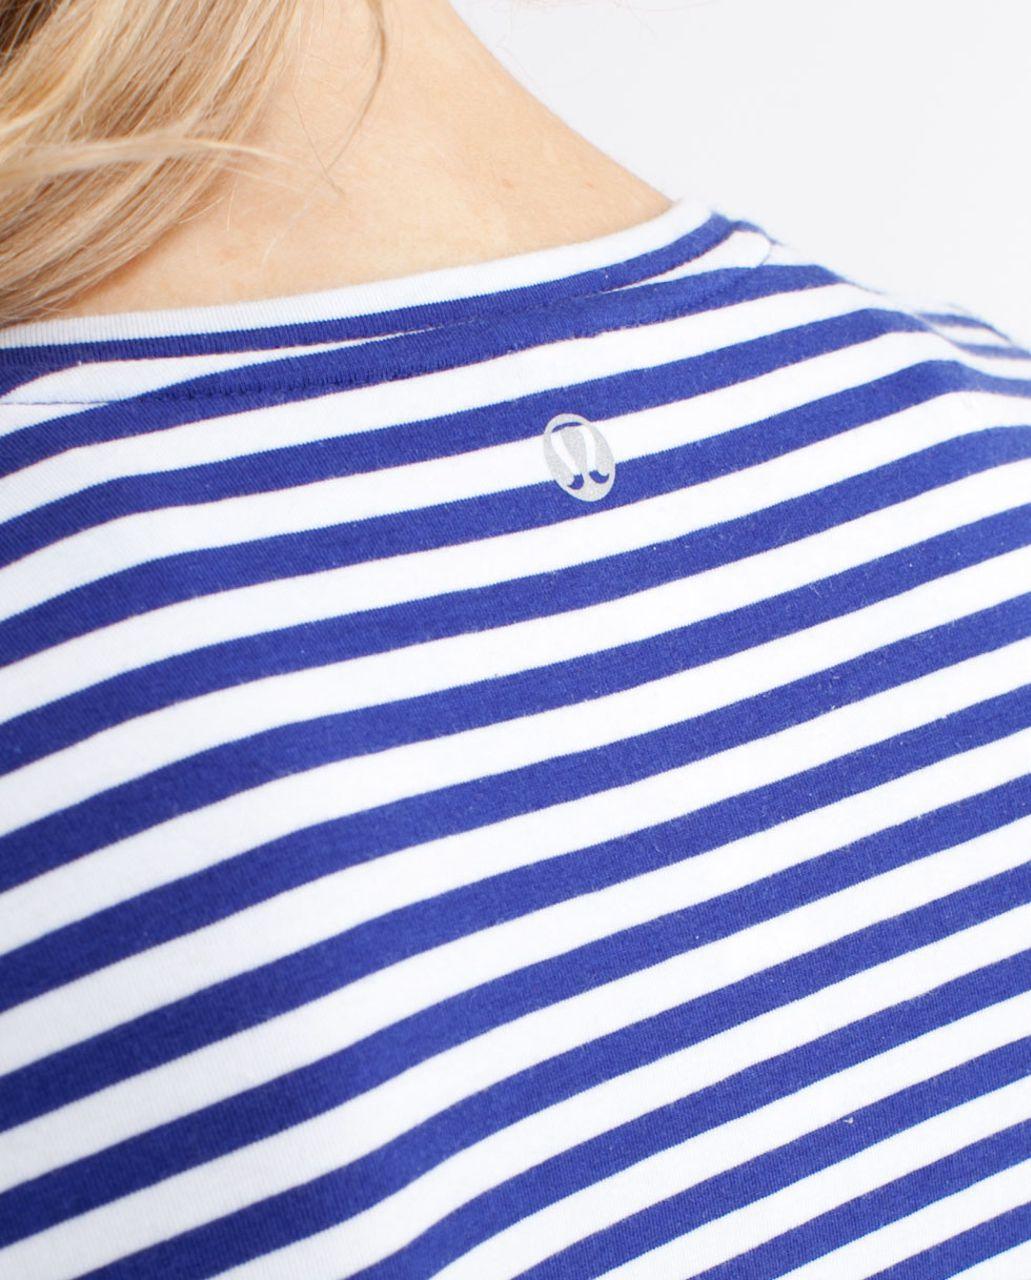 Lululemon Lively Crewneck Tee *Vitasea - Pigment Blue White Narrow Bold Stripe